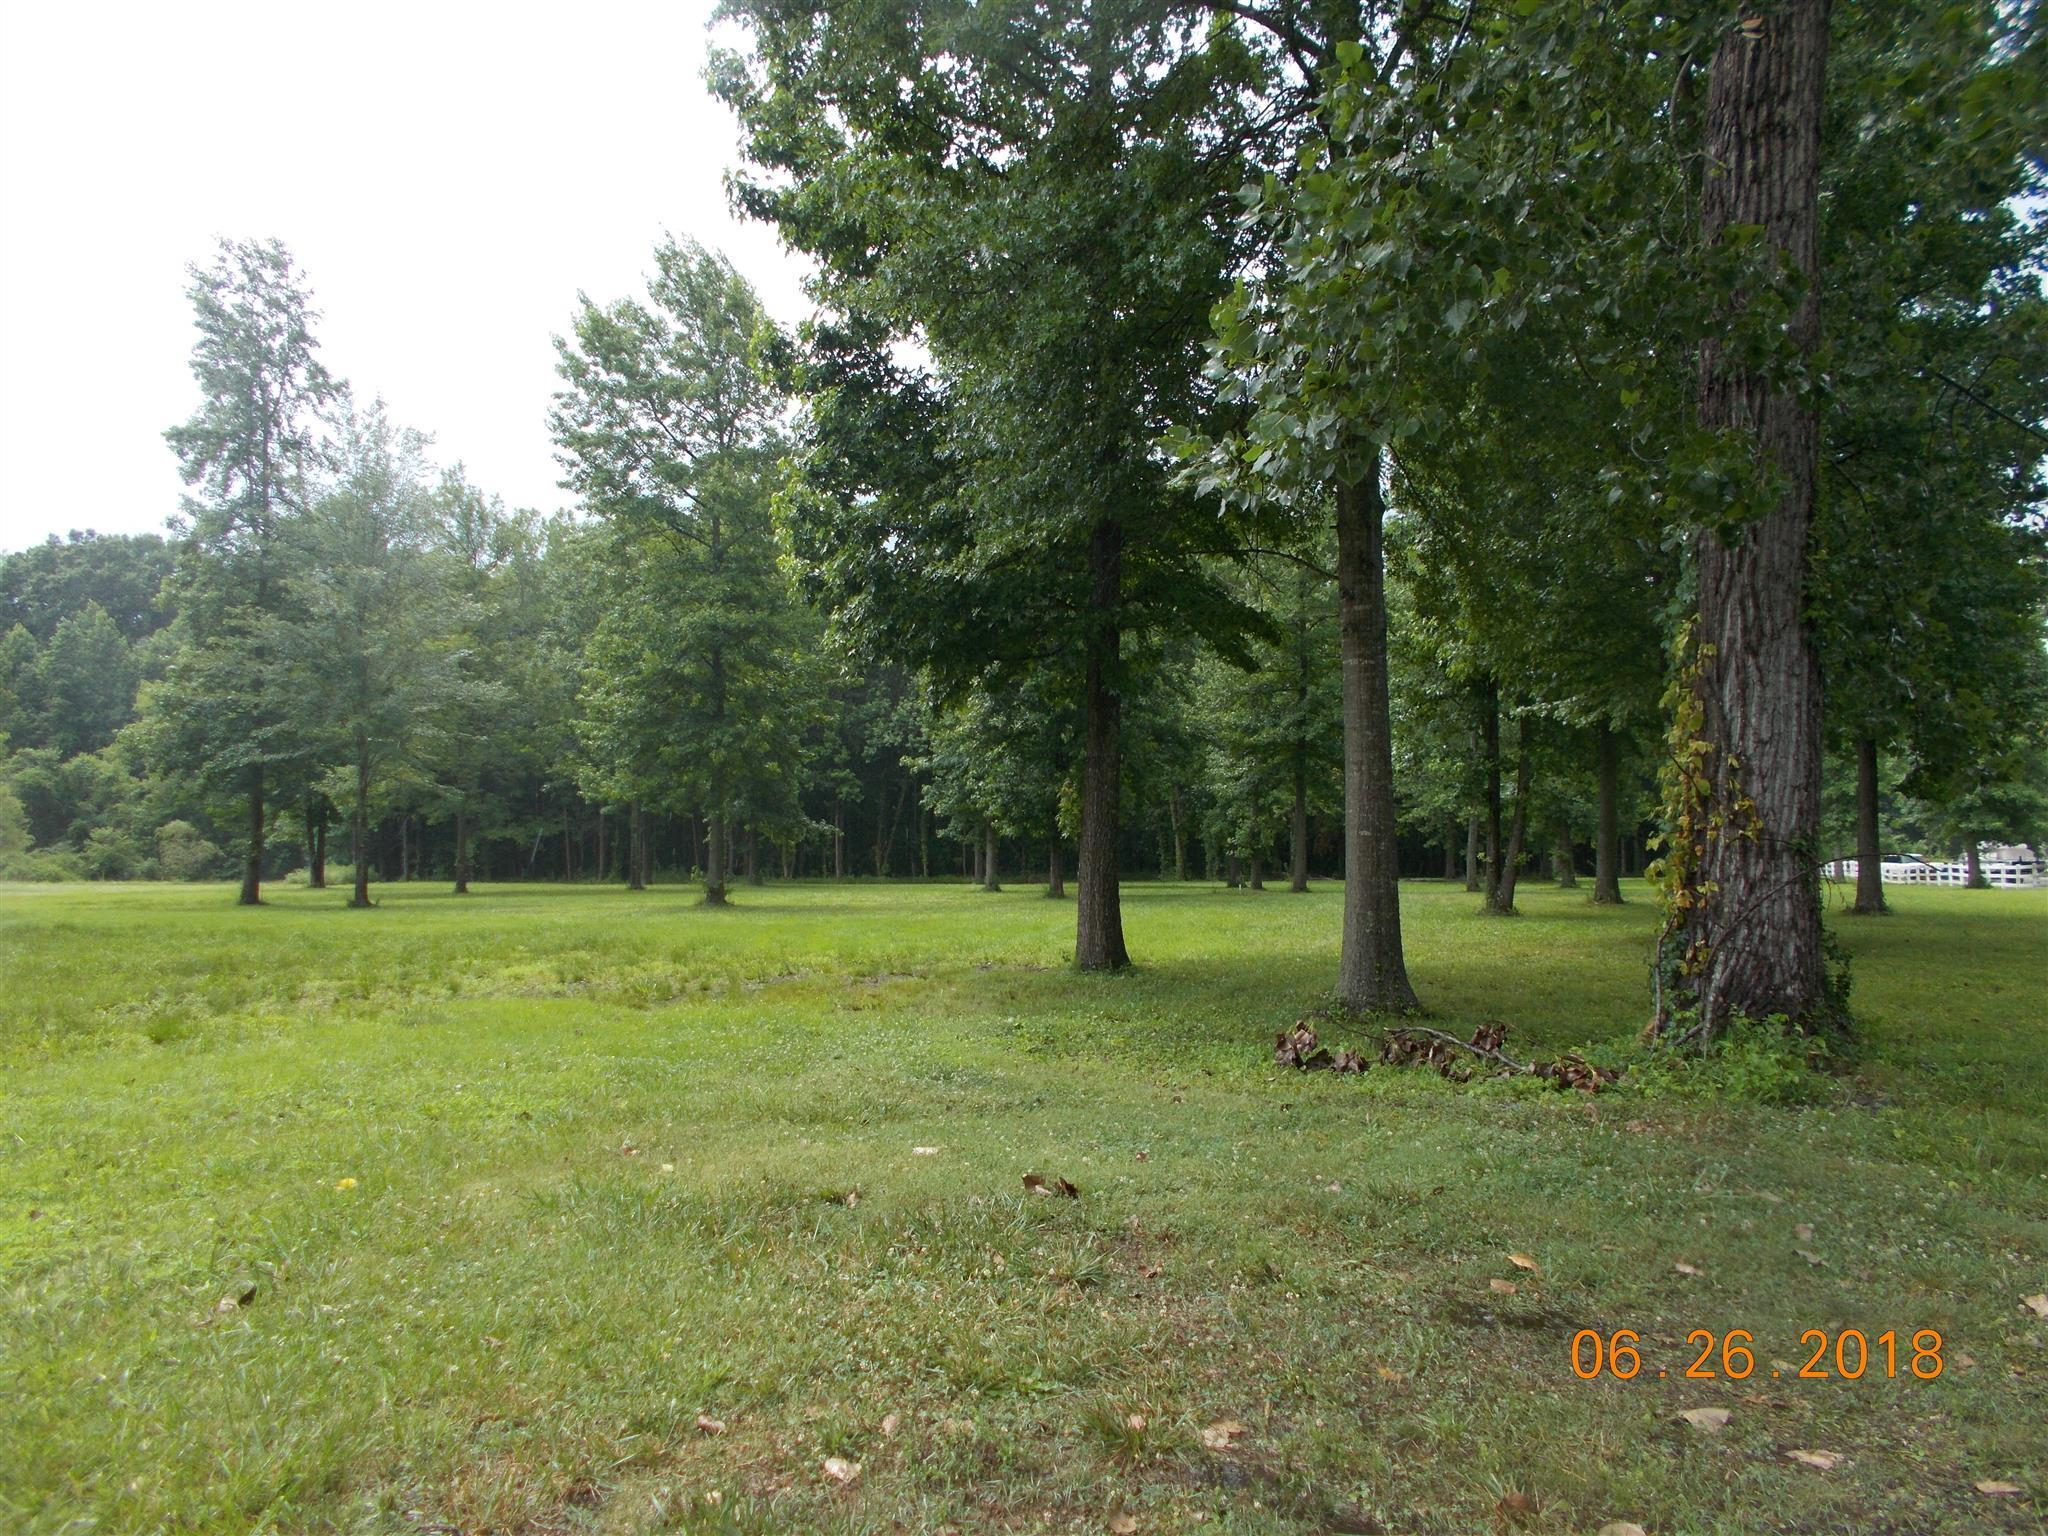 0 Matlock Dr, Chapmansboro, TN 37035 - Chapmansboro, TN real estate listing